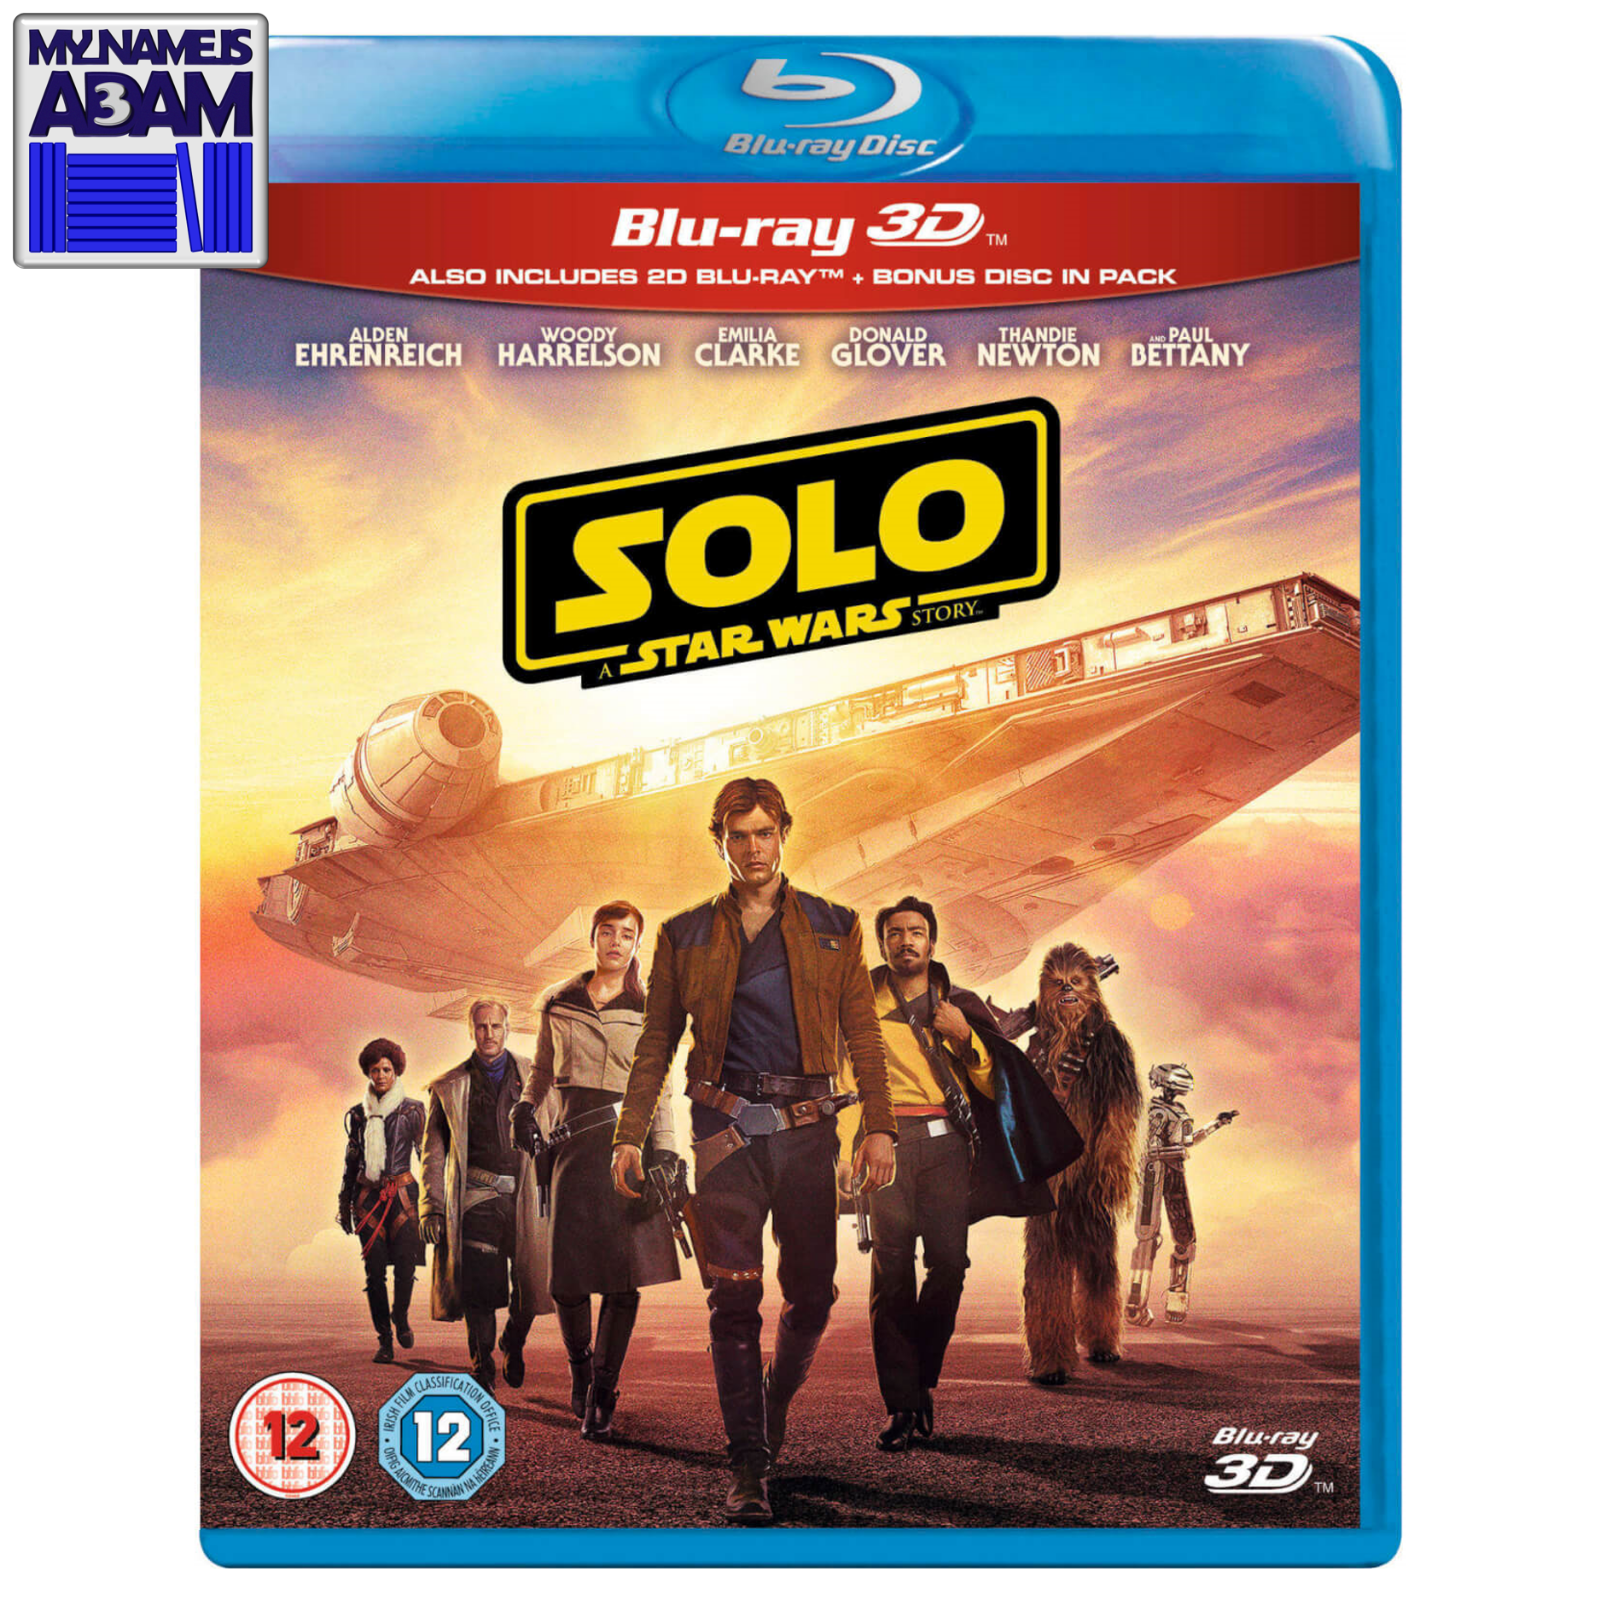 SOLO: A STAR WARS STORY Blu-ray 3D + 2D + Bonus (REGION FREE) LIMITED SALE